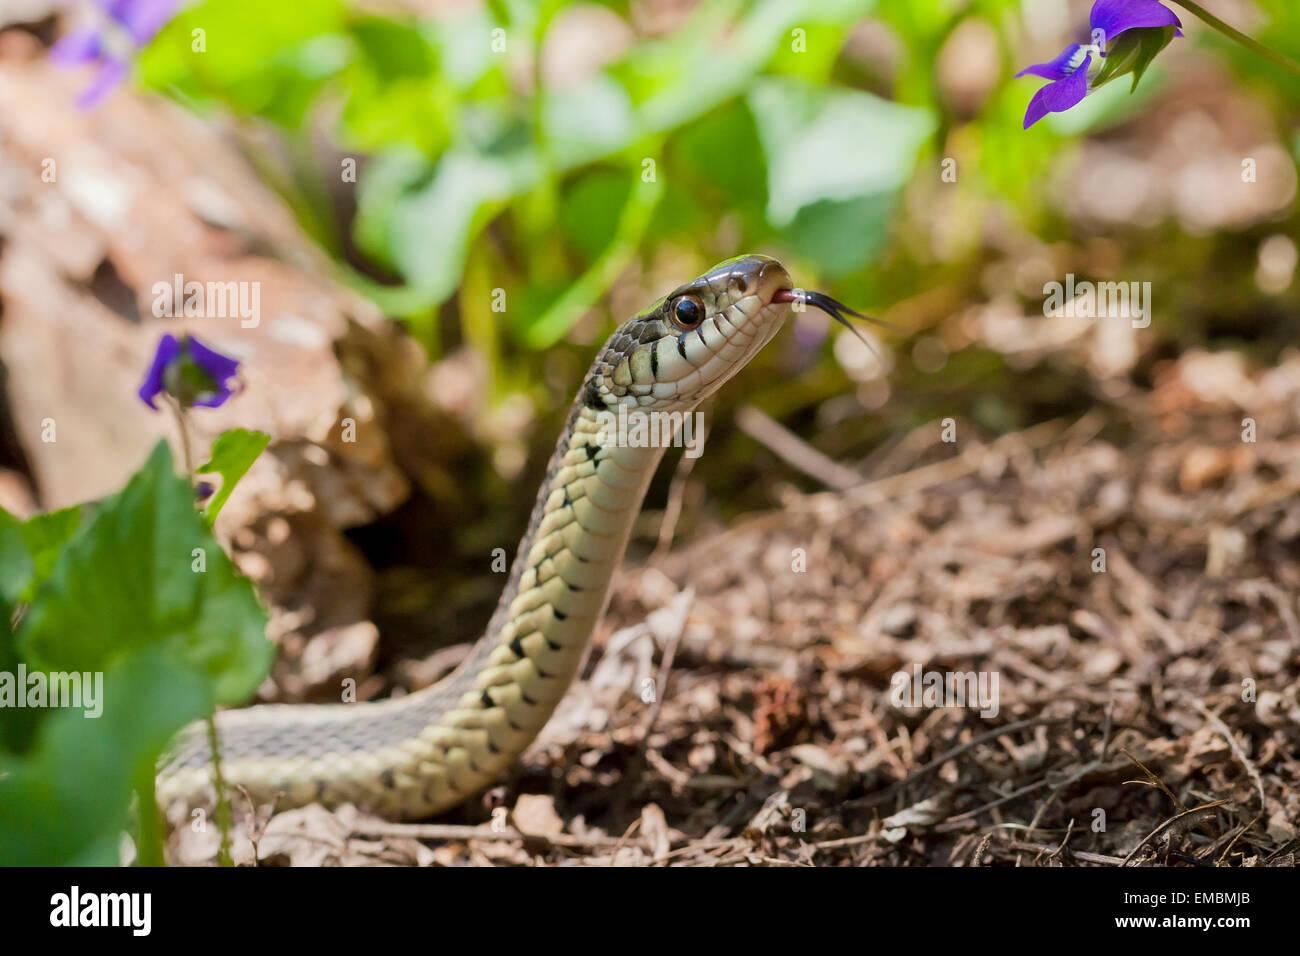 Gemeinsame garter snake (Thamnophis sirtalis) - Virginia USA Stockfoto